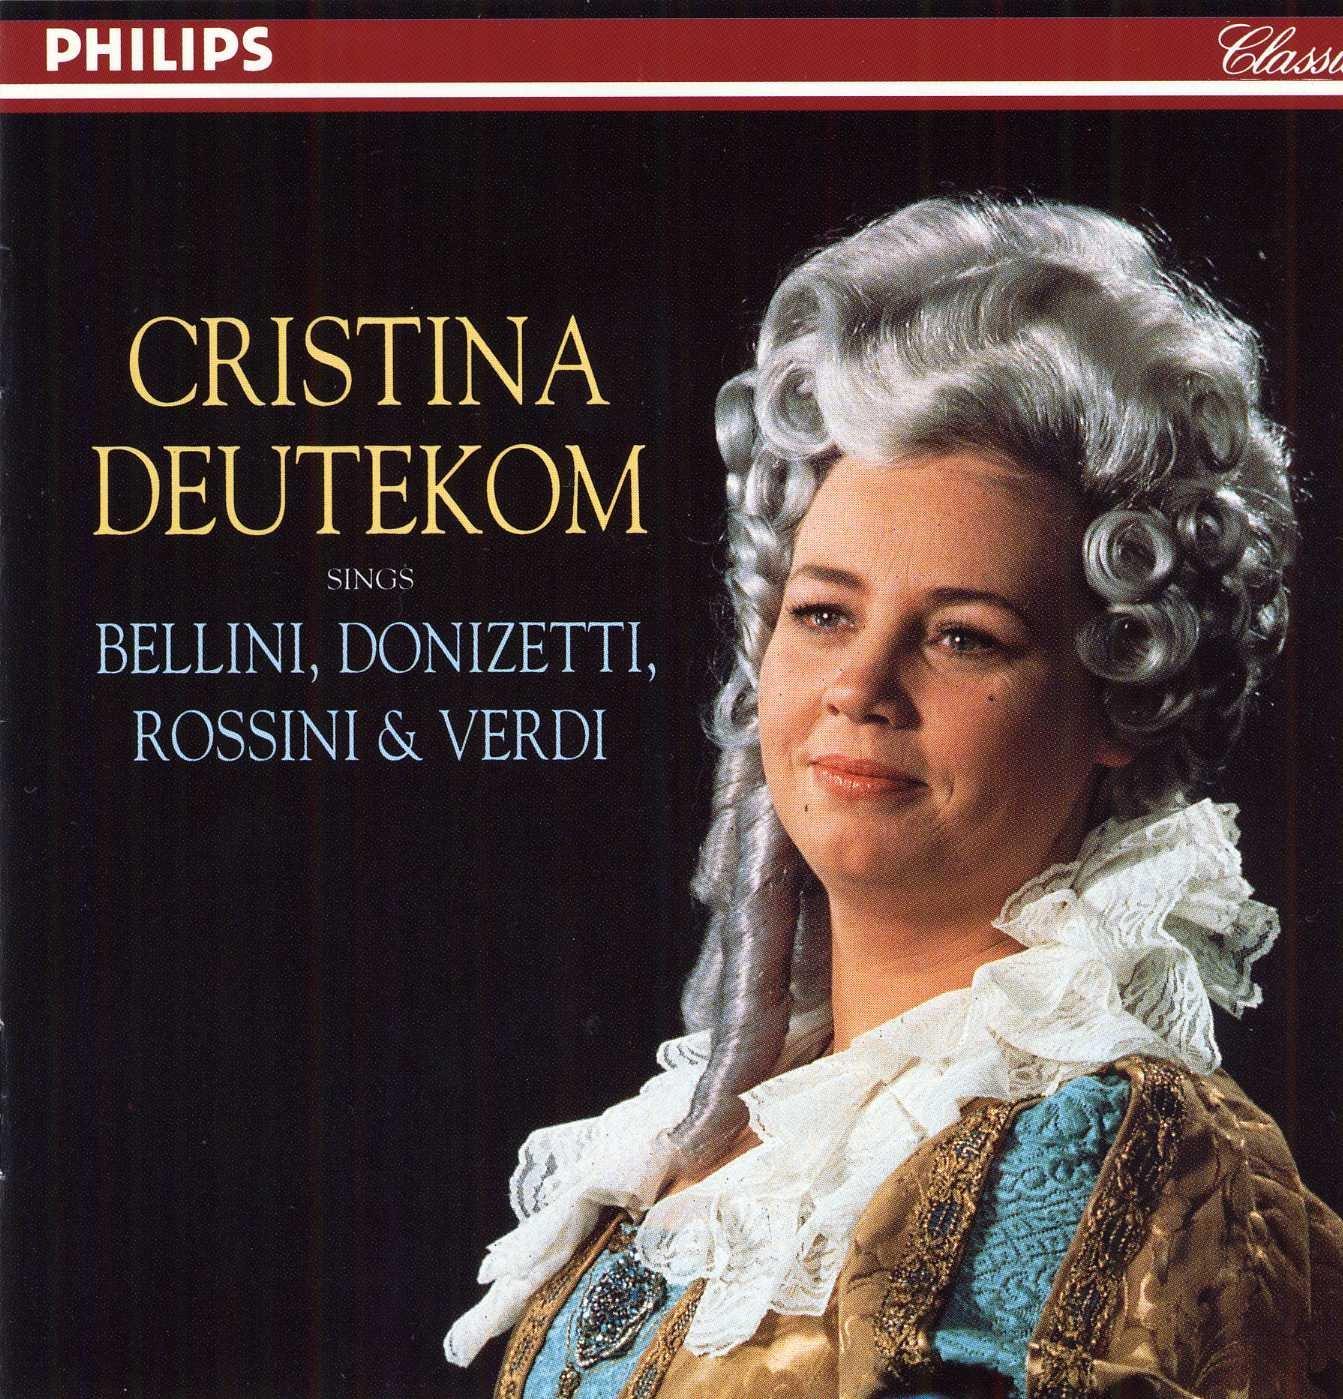 CRISTINA DEUTEKOM SINGS BELLINI,DONIZETTI,ROSSINI & VERDI B000025BJK